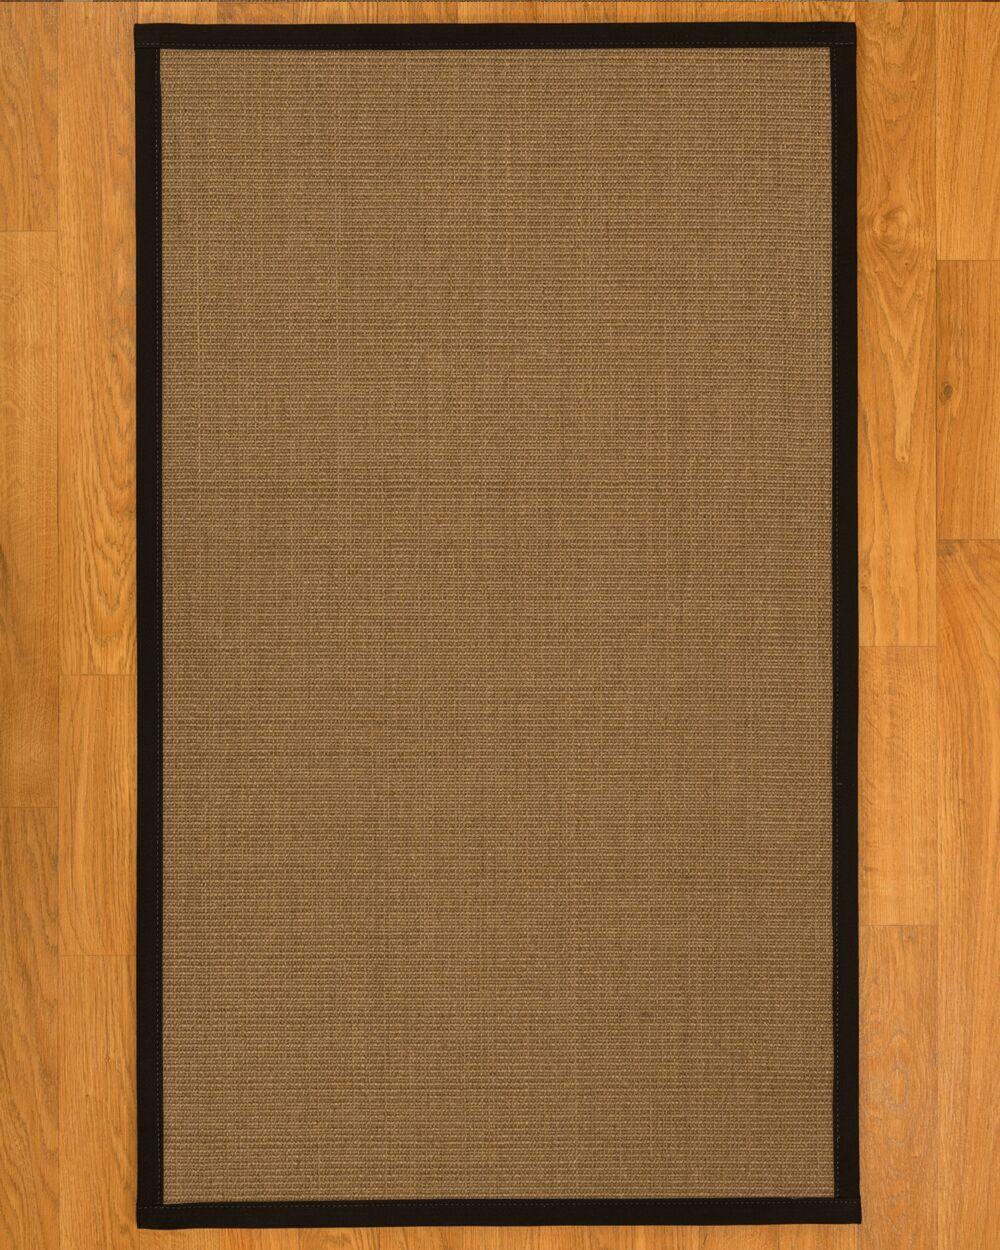 Jamesville Natural Fiber Sisal Plus Bonus Hand-Woven Beige Area Rug Rug Size: Rectangle 6' x 9'